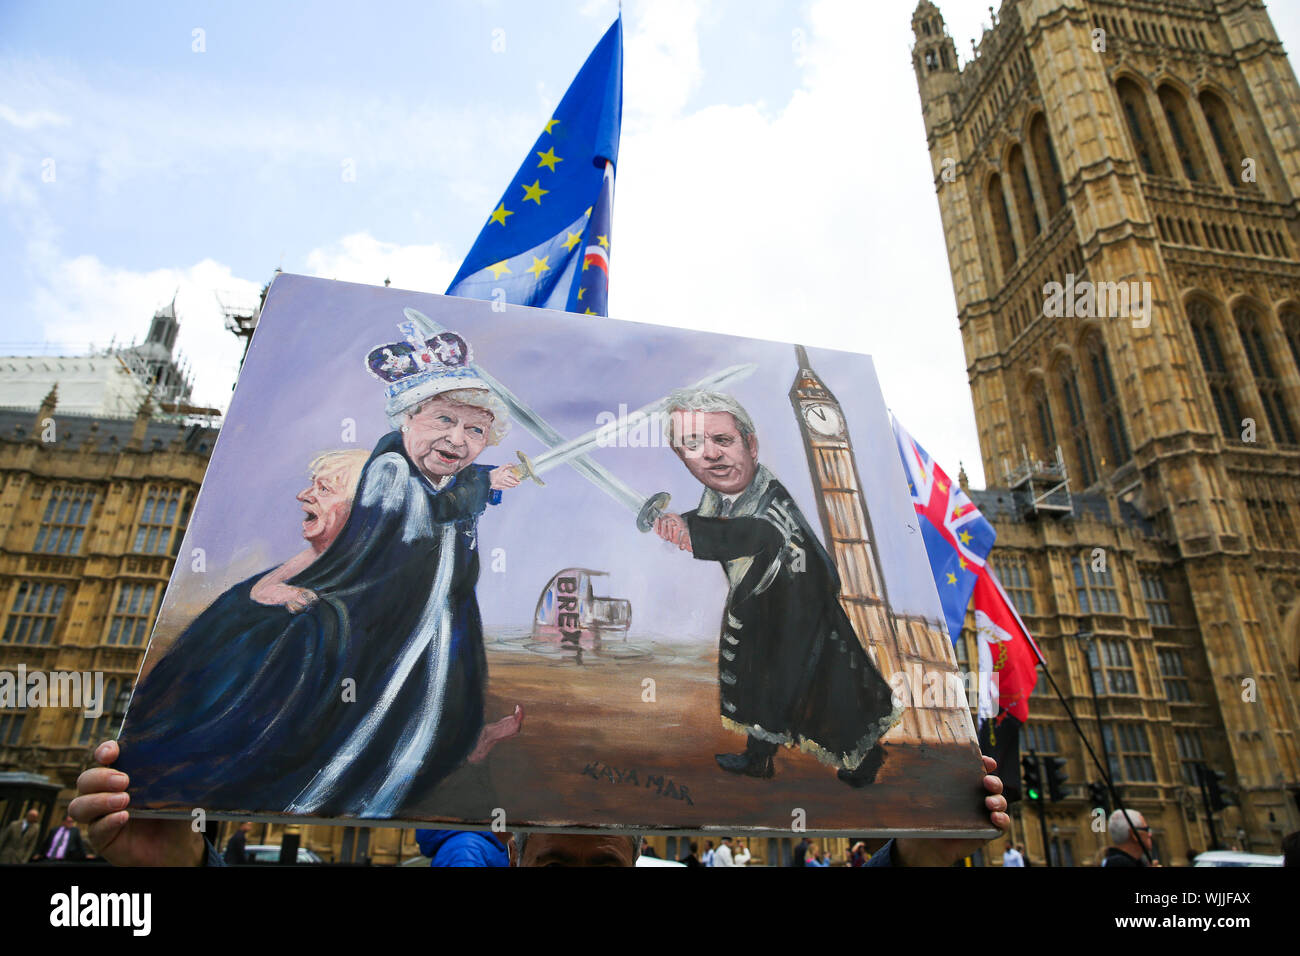 A Piece Of Satirical Artwork By Artist Kaya Mar Showing The Queen